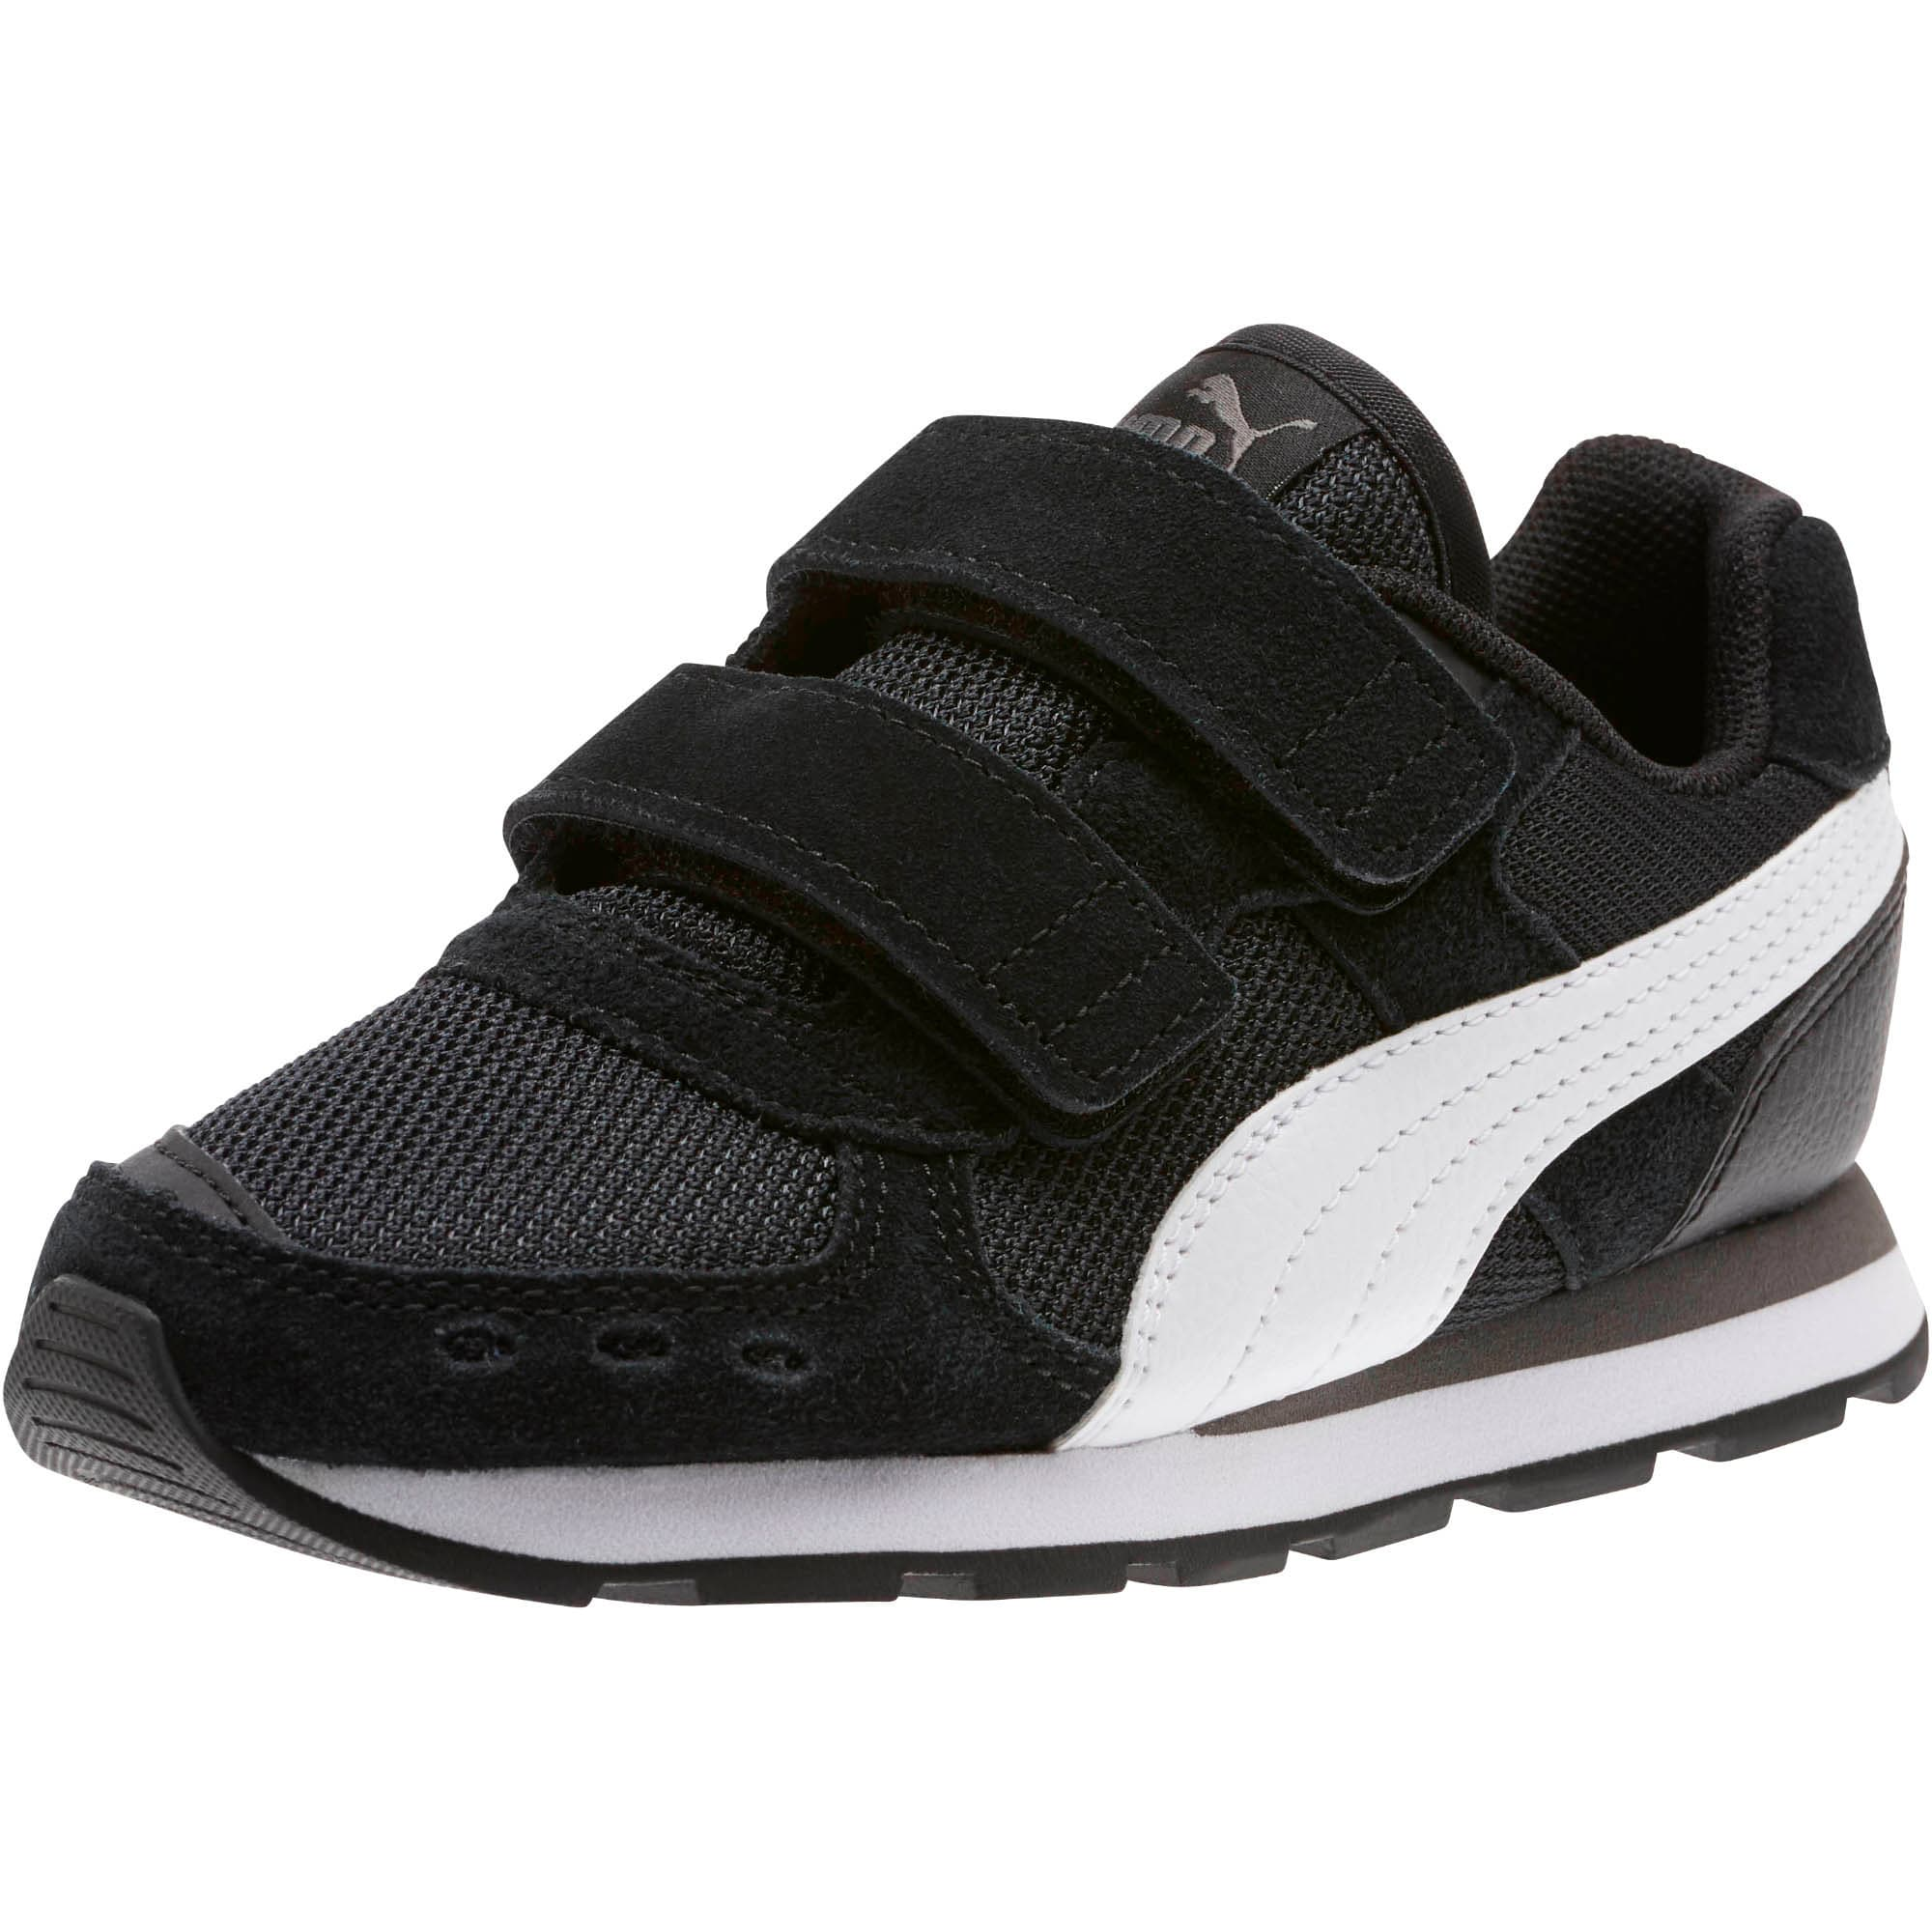 Thumbnail 1 of Vista Little Kids' Shoes, Puma Black-Puma White, medium